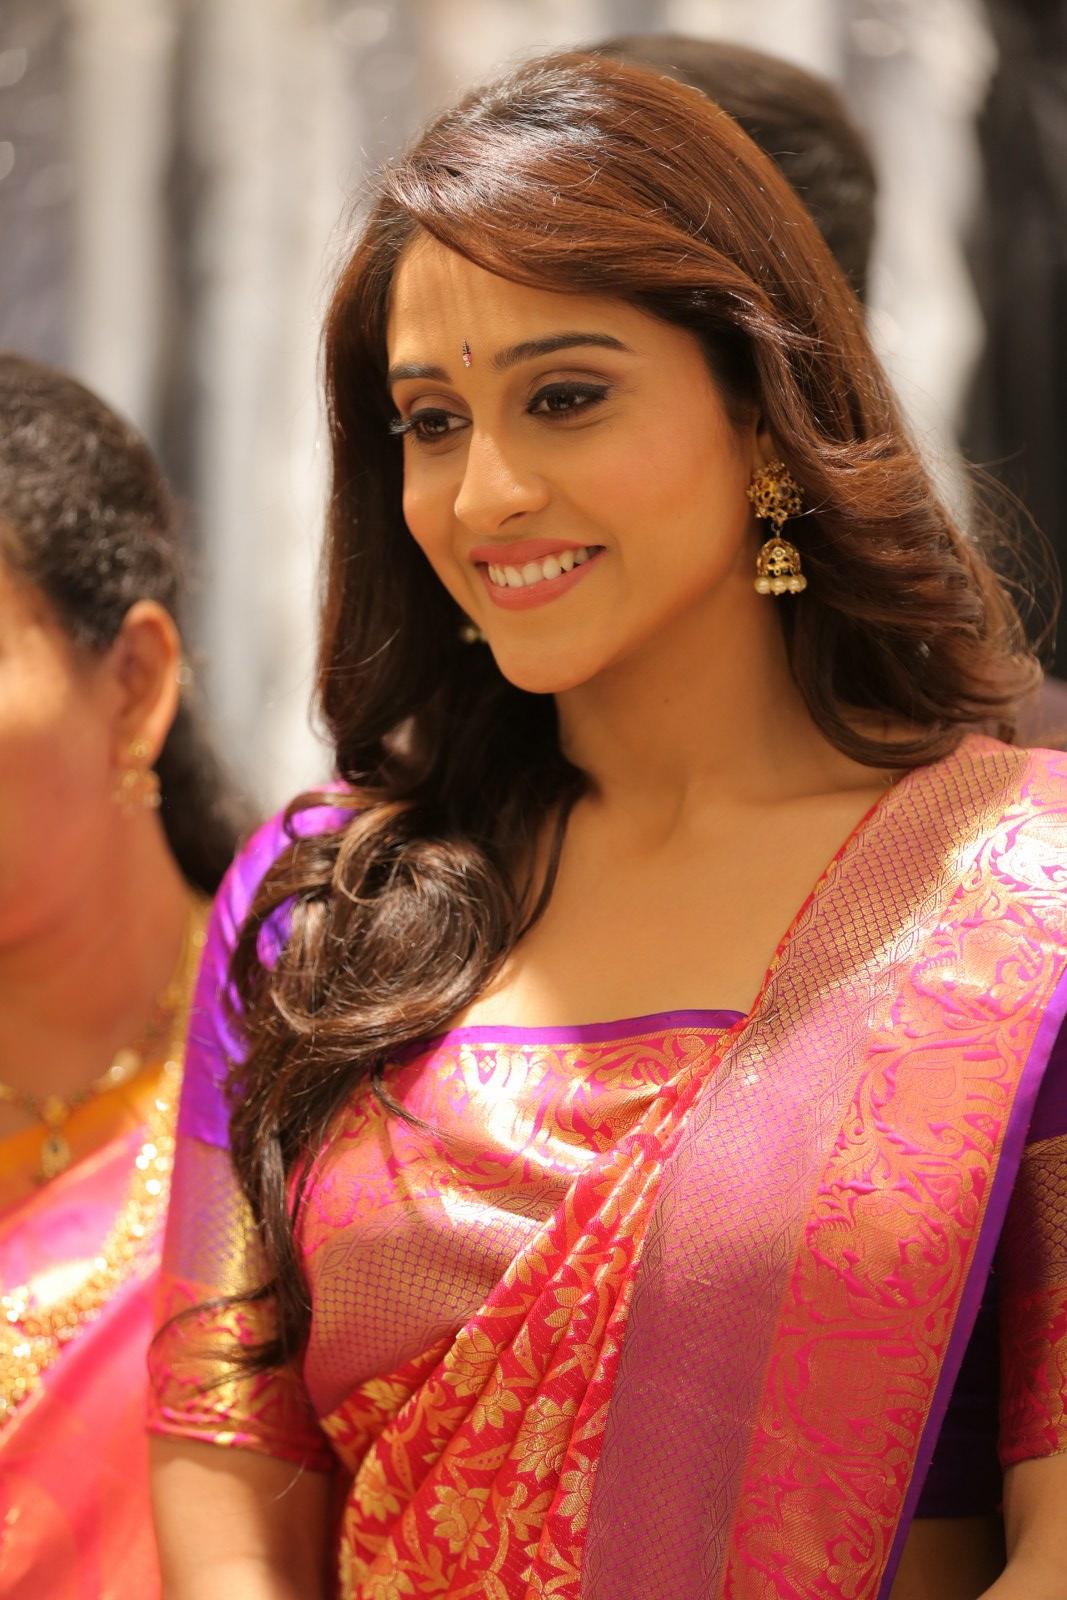 regina cassandra hot looking in beautiful traditional saree lovelygirlspak